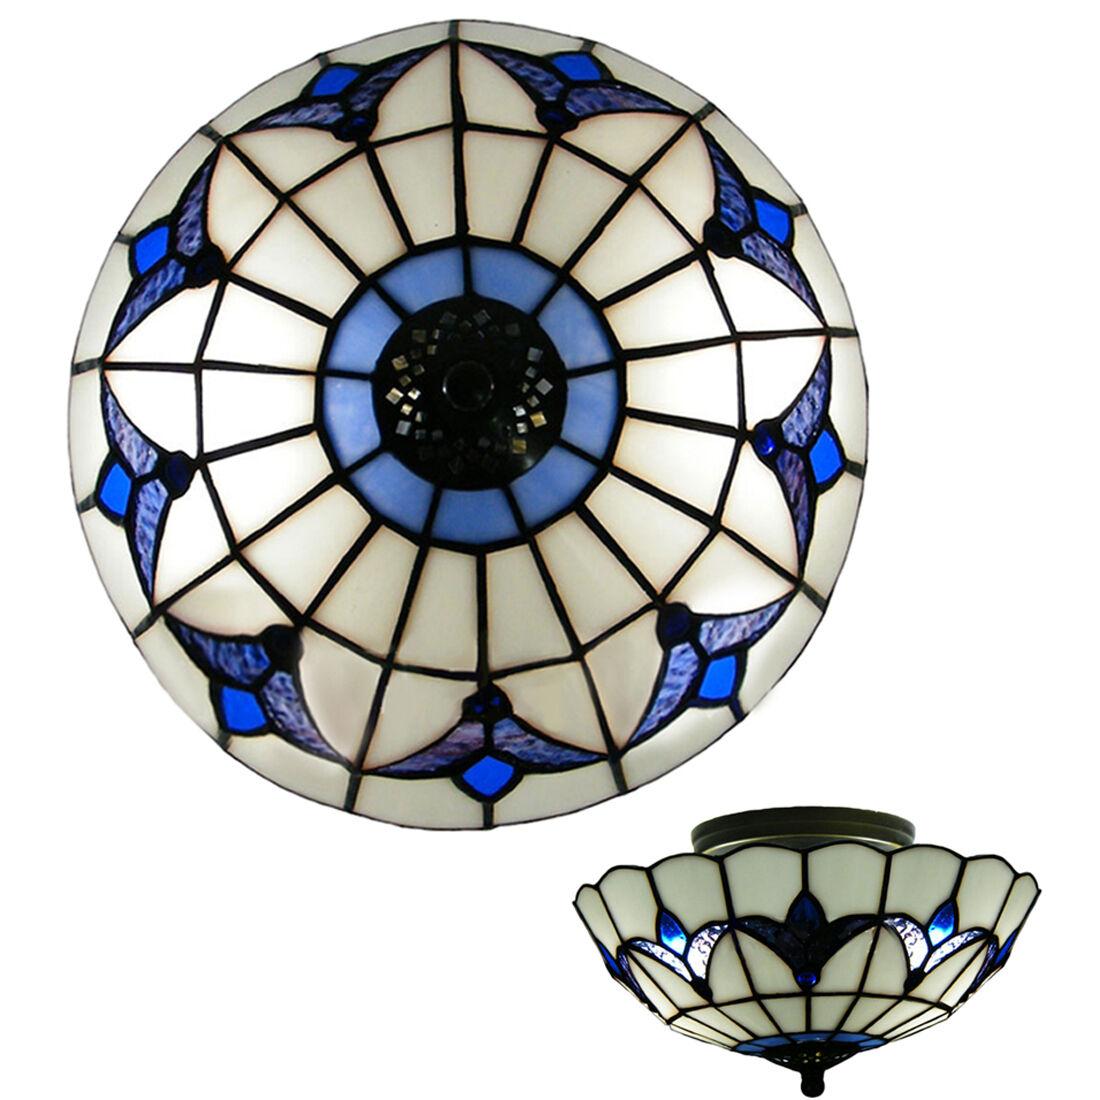 Antique style 16 3 light tiffany glass semi flush mount ceiling three lights blue flowers motif glass shade tiffany flush mount ceiling light aloadofball Gallery